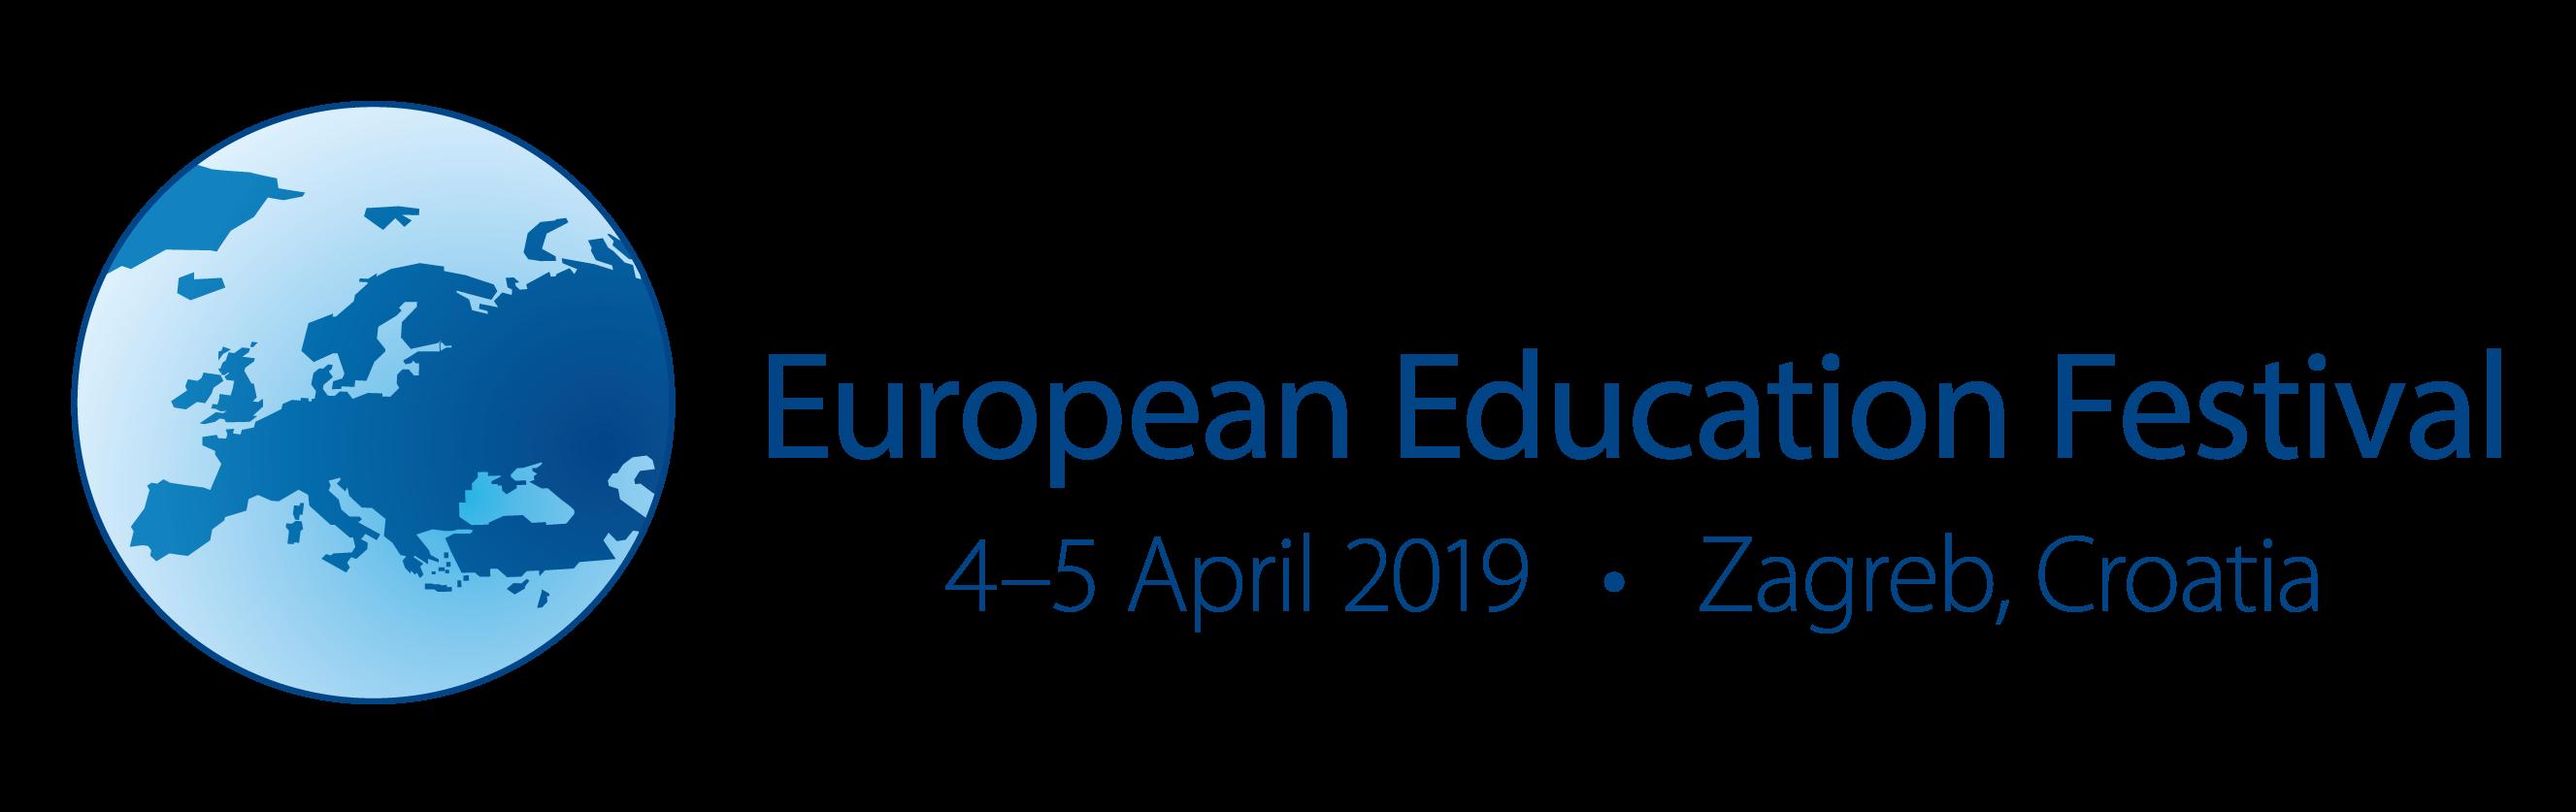 European Education Festival 2019